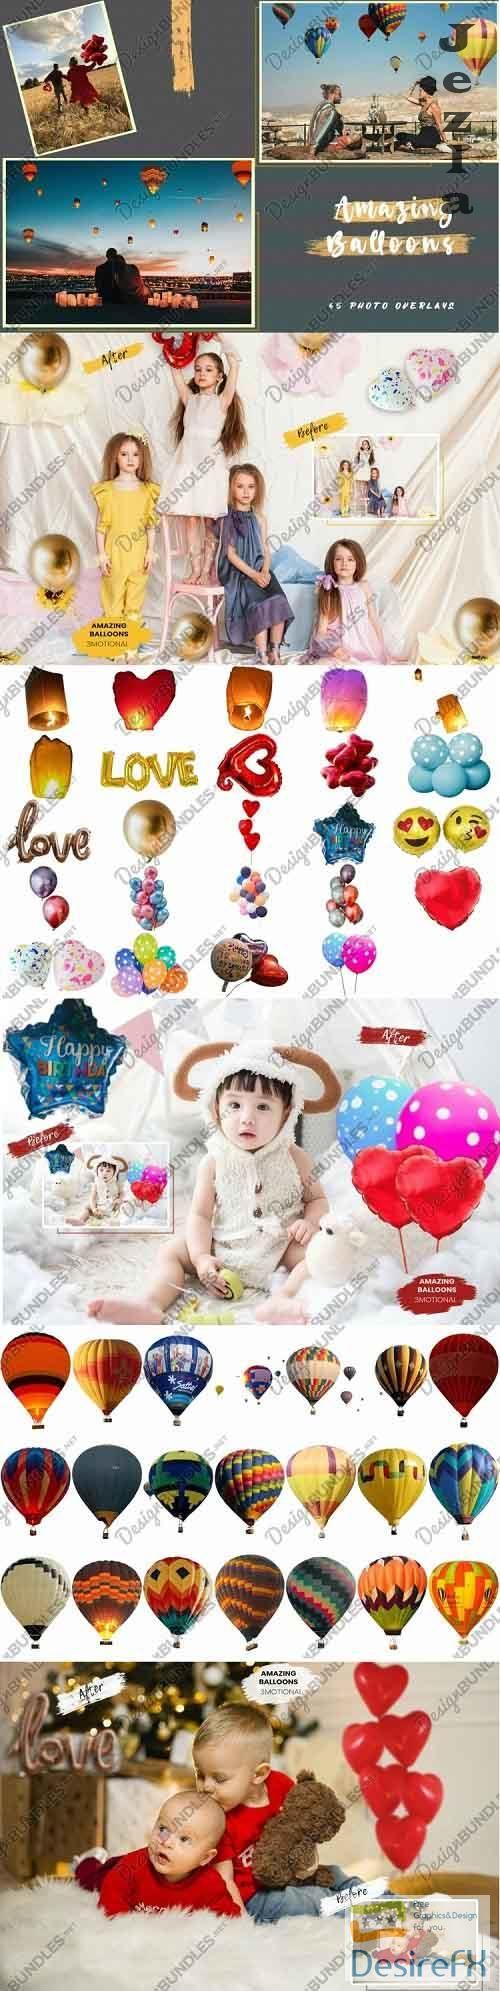 45 Amazing Balloons Photo Overlays - 1163671